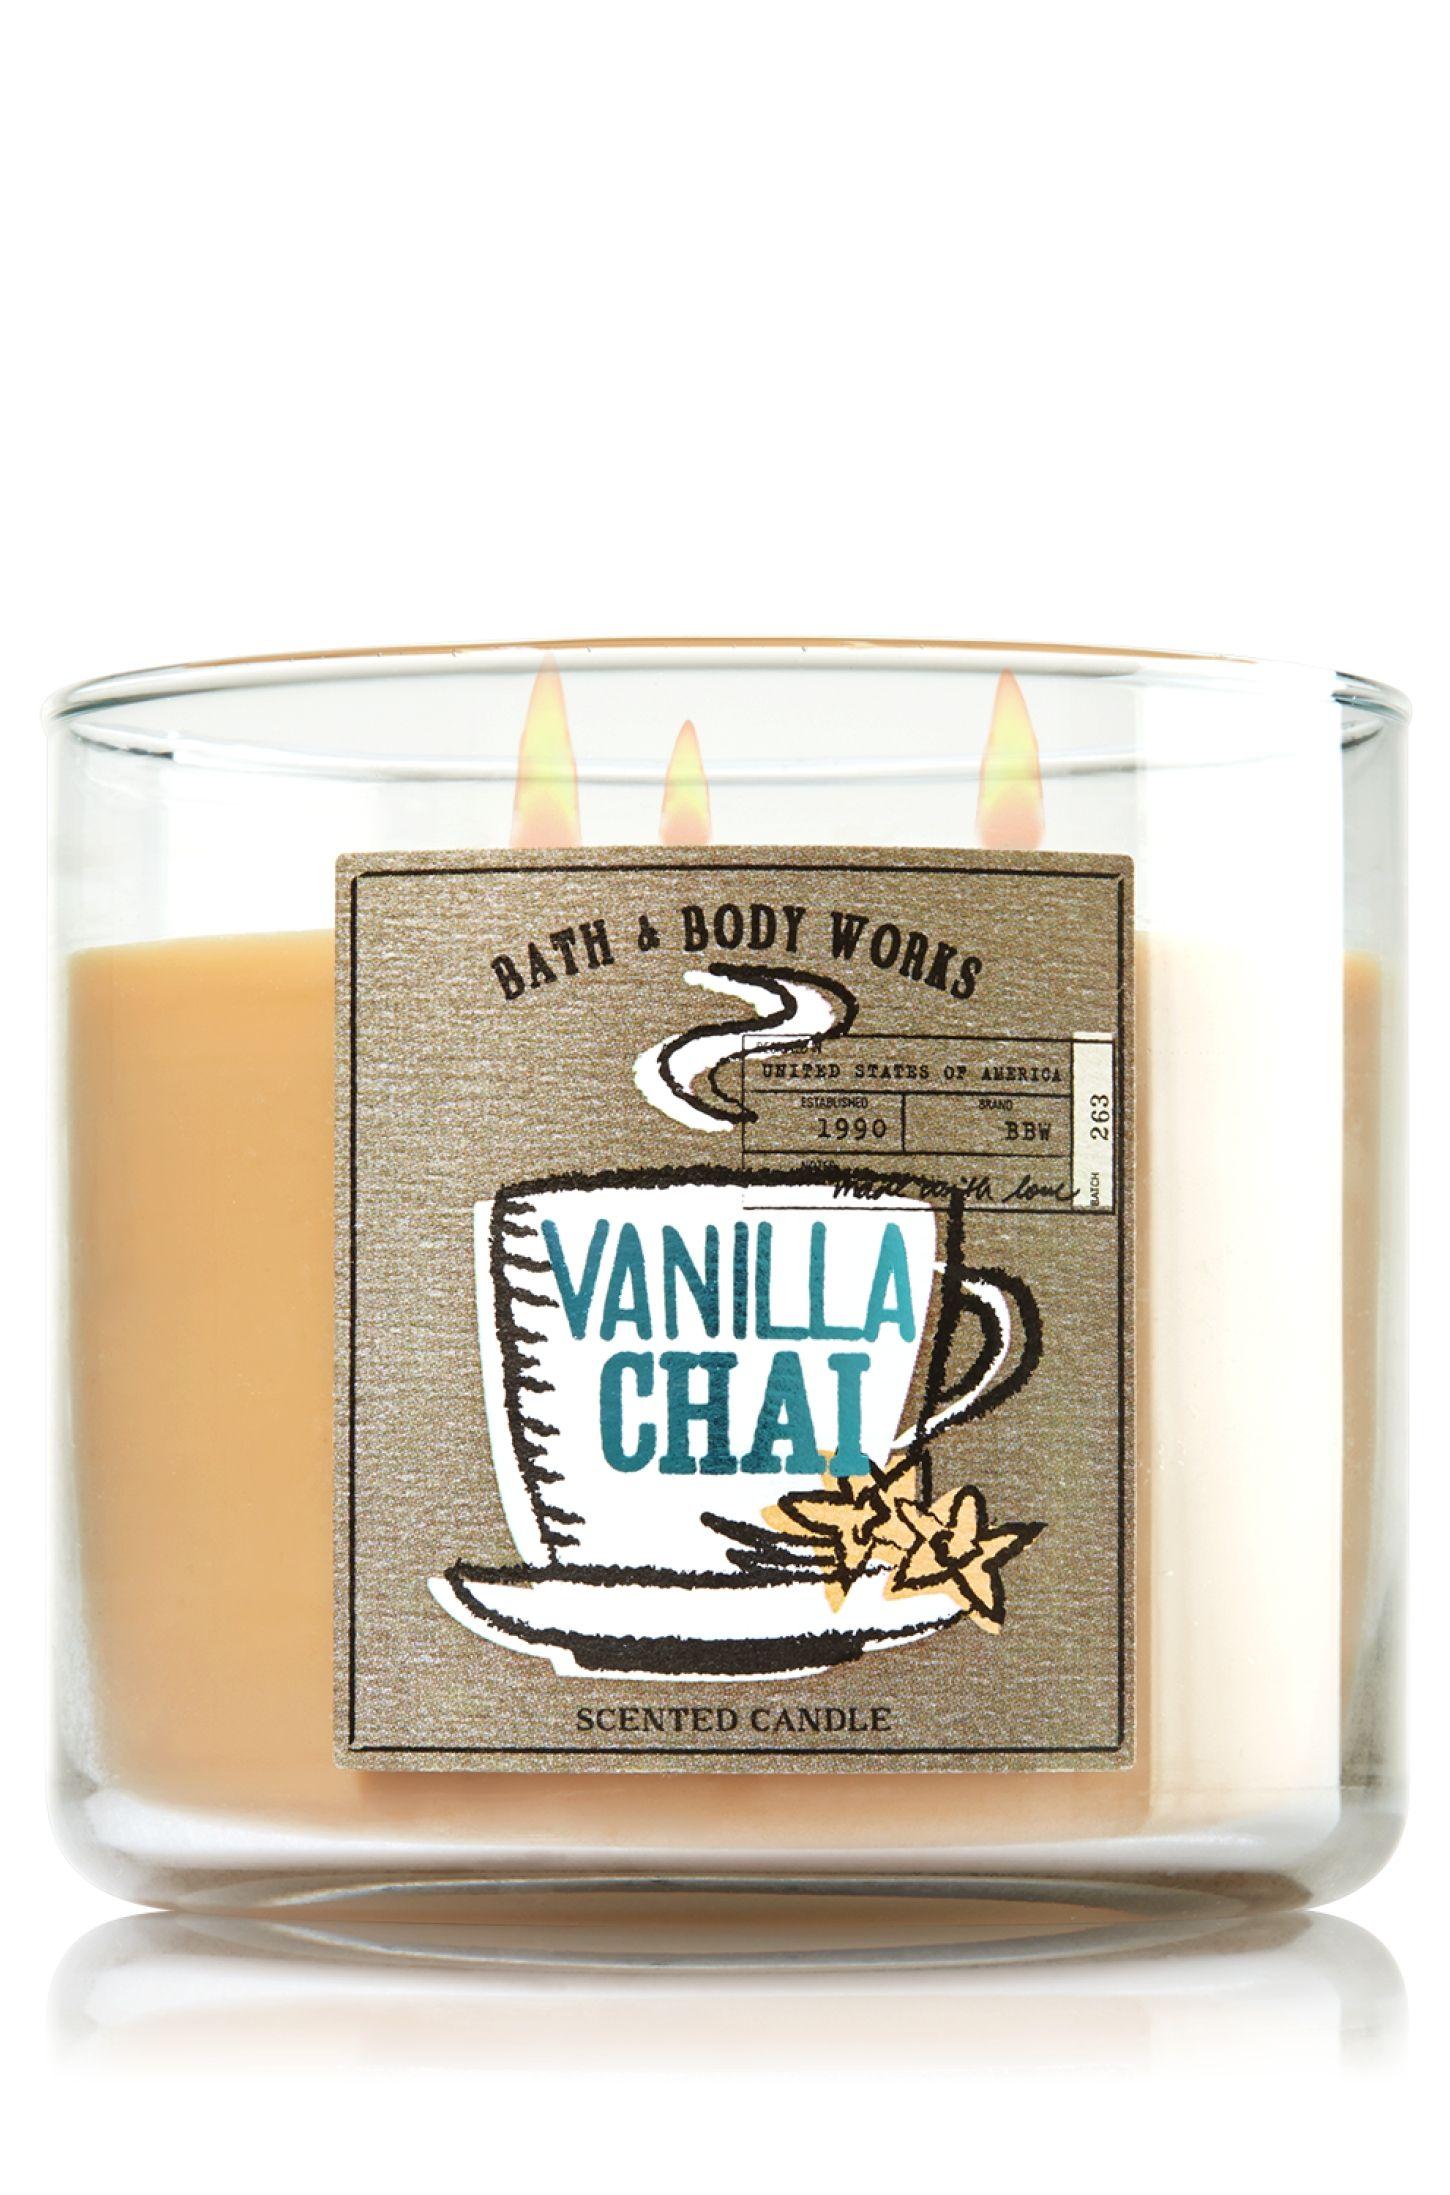 vanilla chai 3 wick candle home fragrance bath body works rh pinterest com